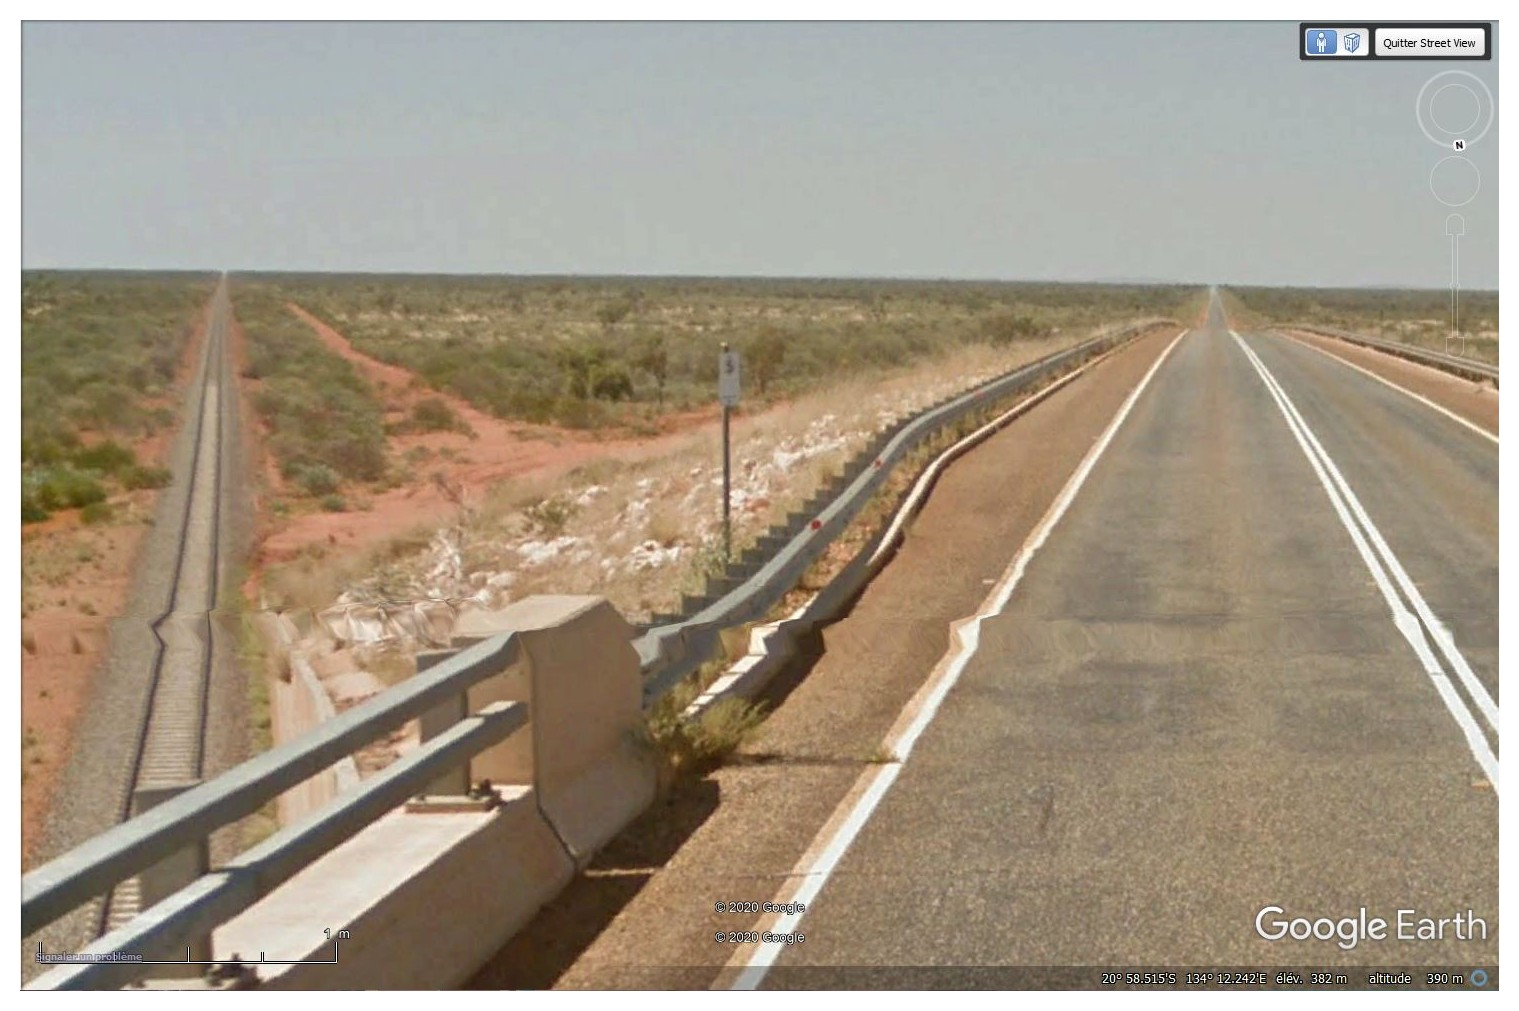 STREET VIEW : les cartes postales de Google Earth - Page 71 Tsge1367